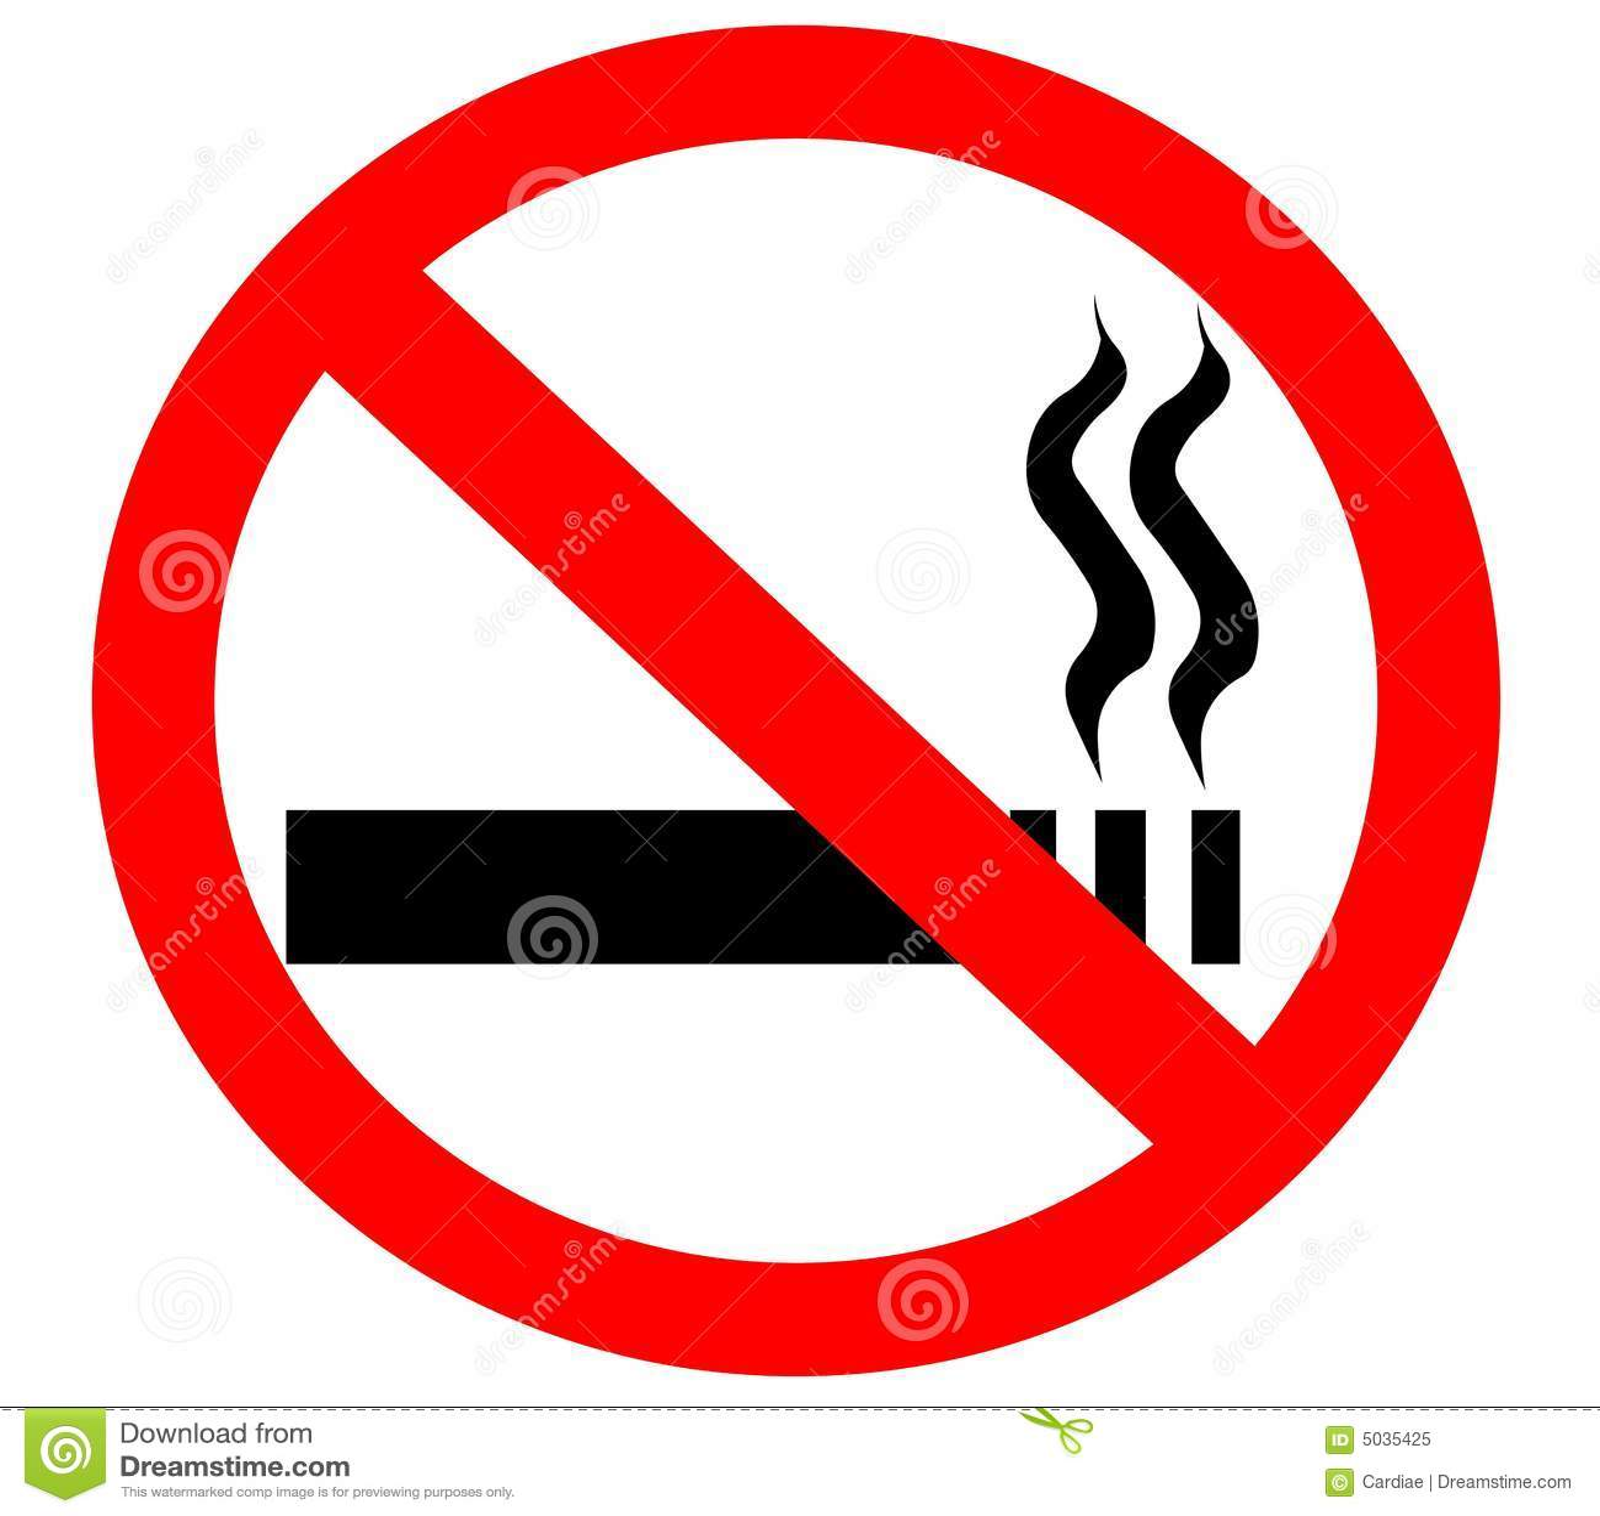 thumbs.dreamstime.com/z/cigarettes-non-fumeurs-de-symbole-de-signe-5035425.jpg